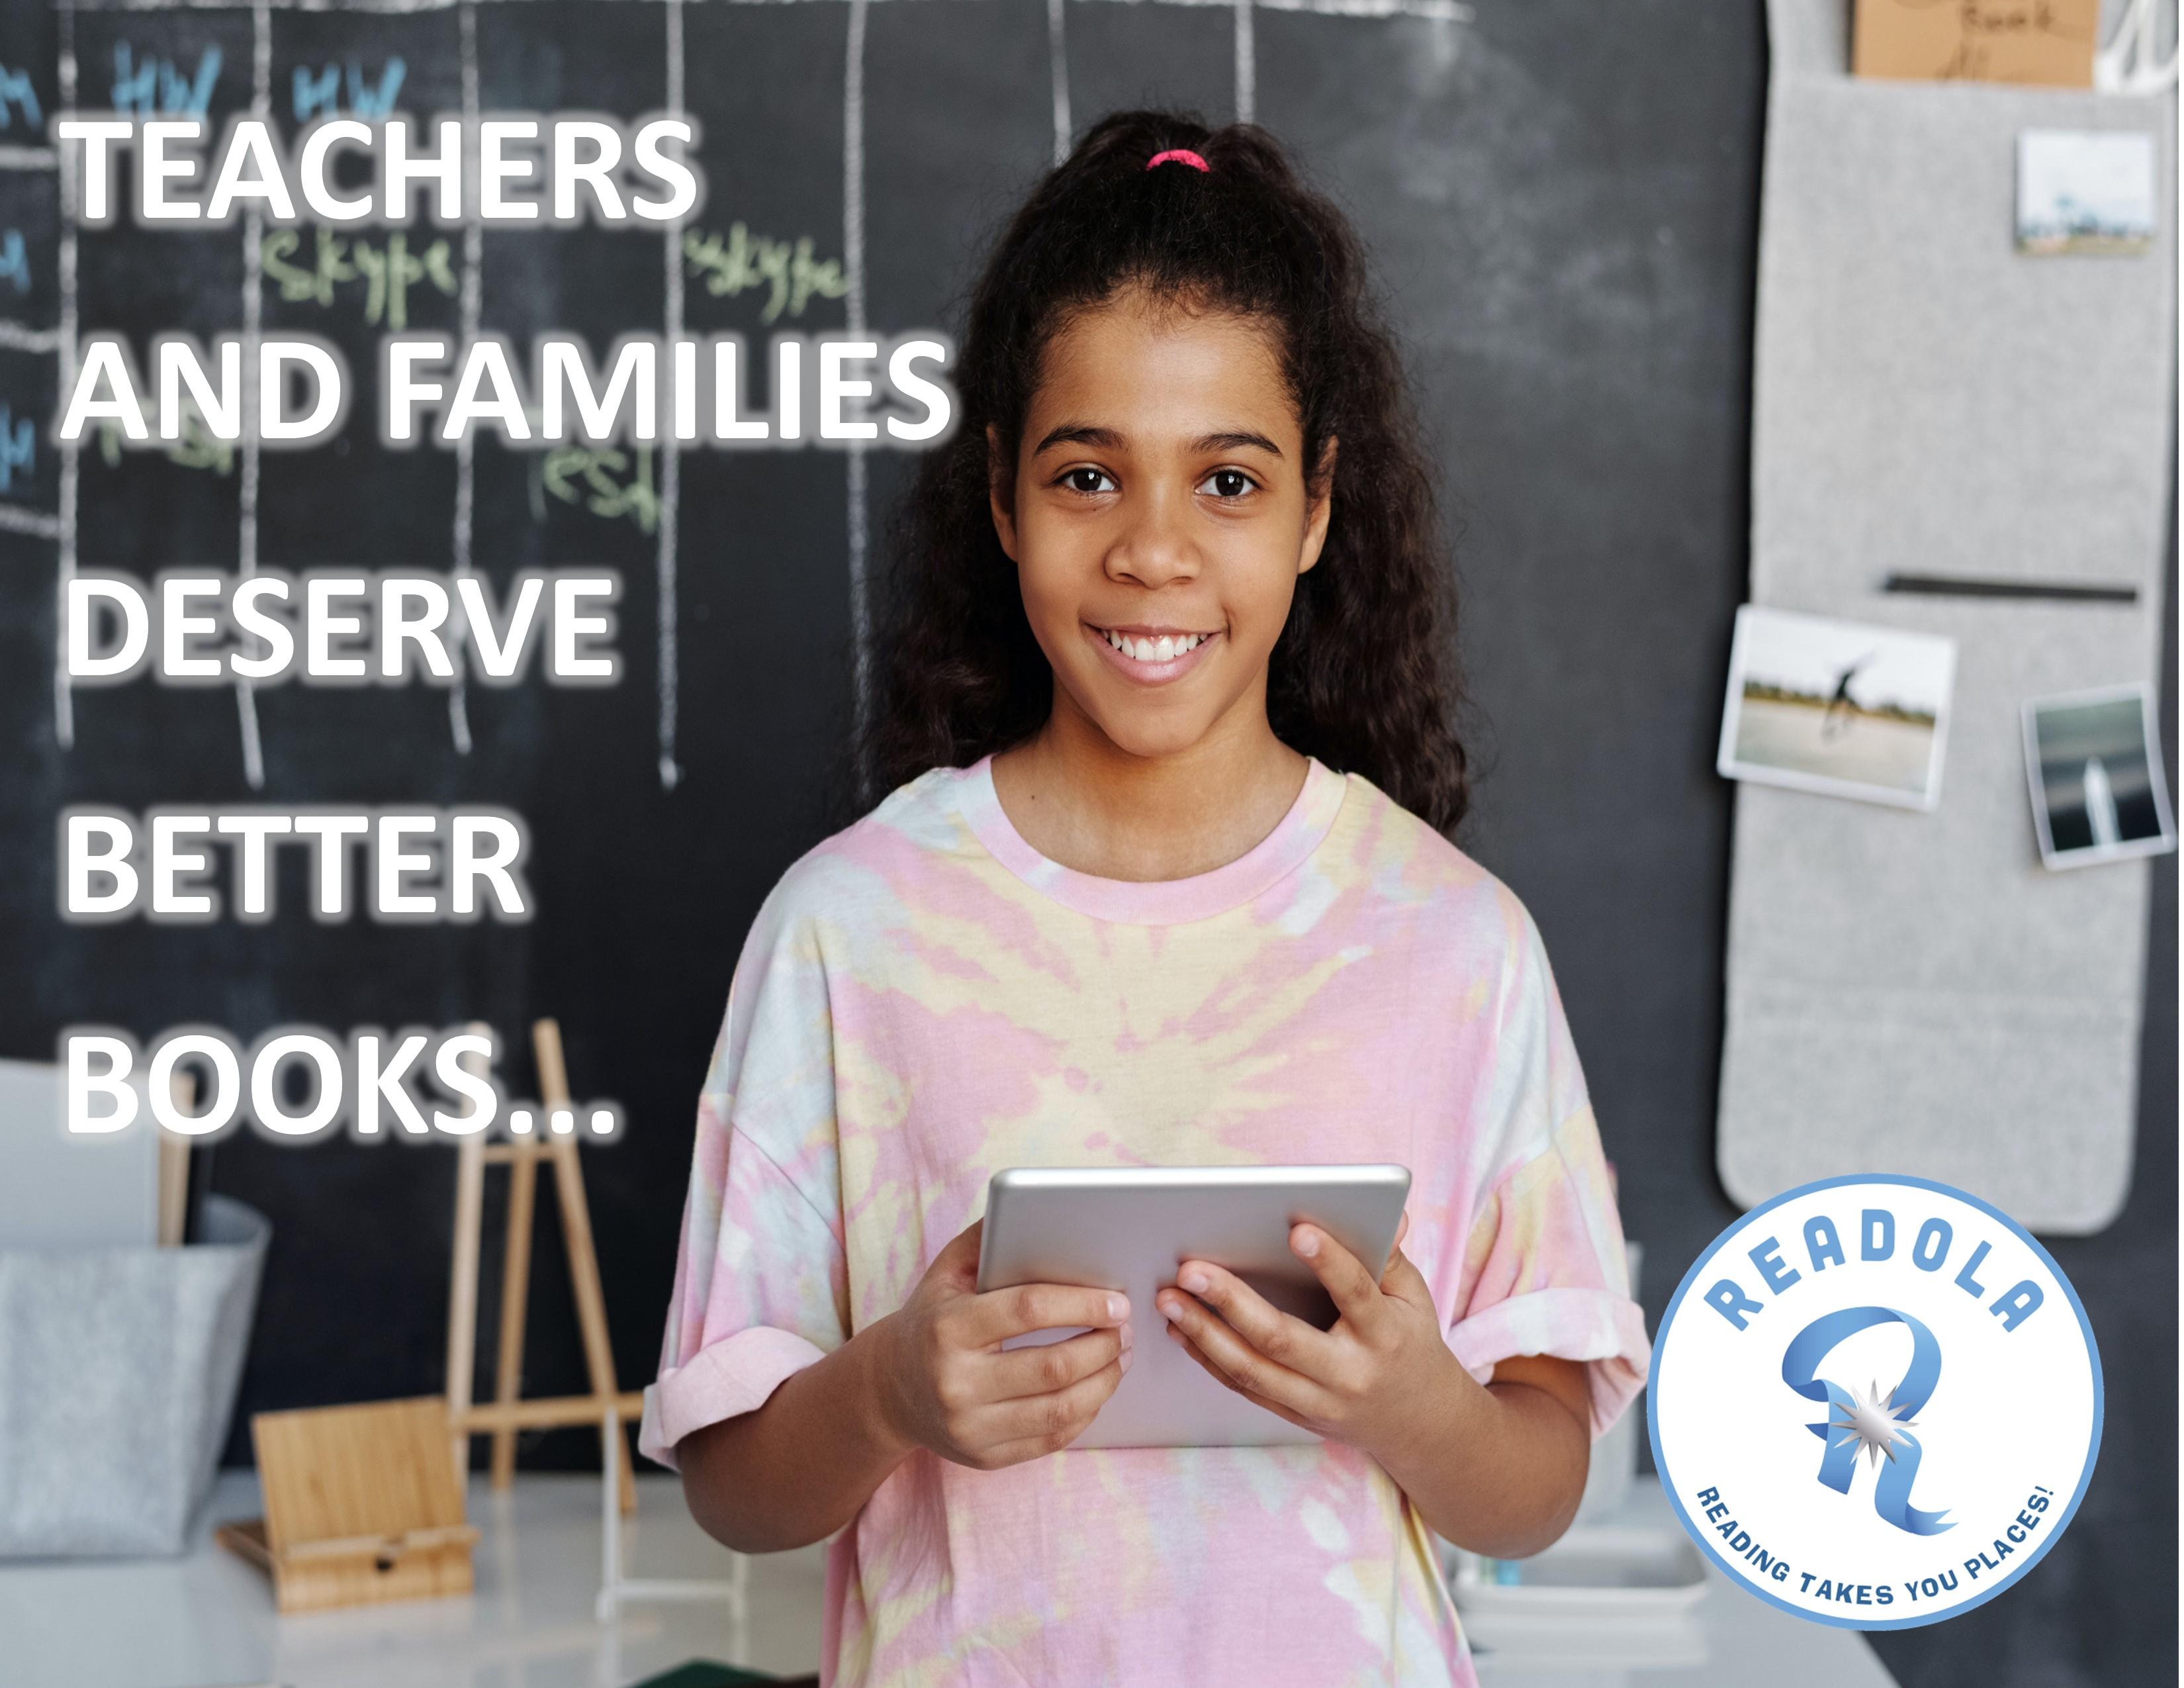 teachers-and-families-deserve-better-books.jpg